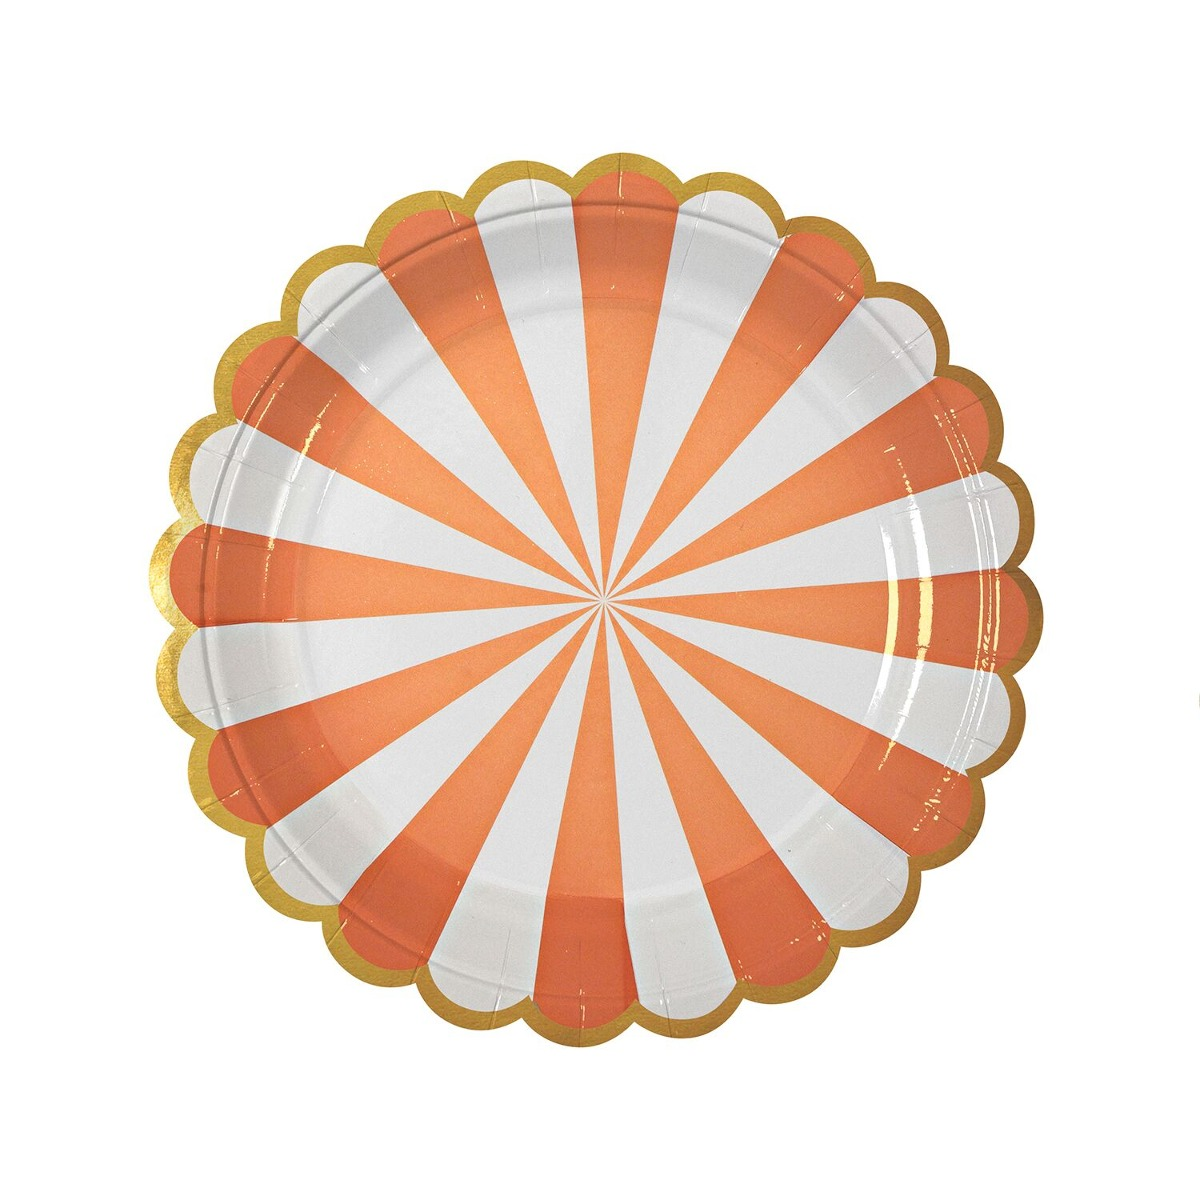 Platos Stripe Naranjas Grandes halloween